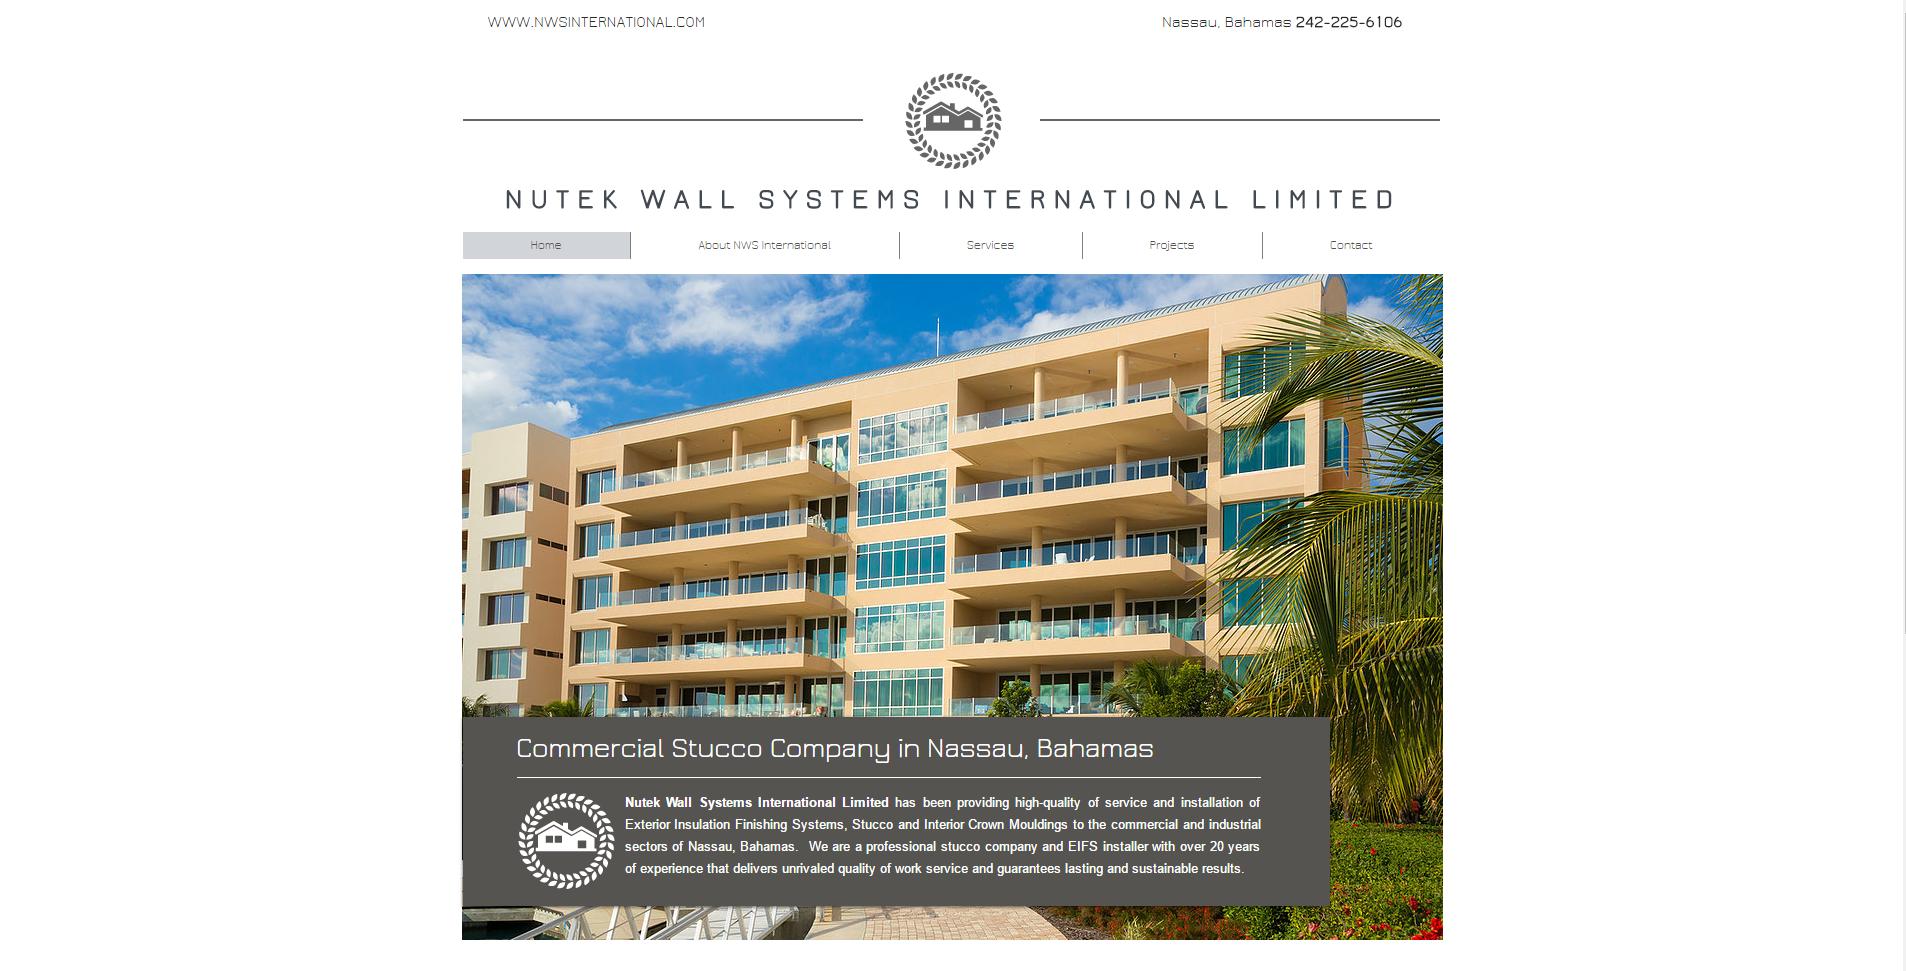 NWS International